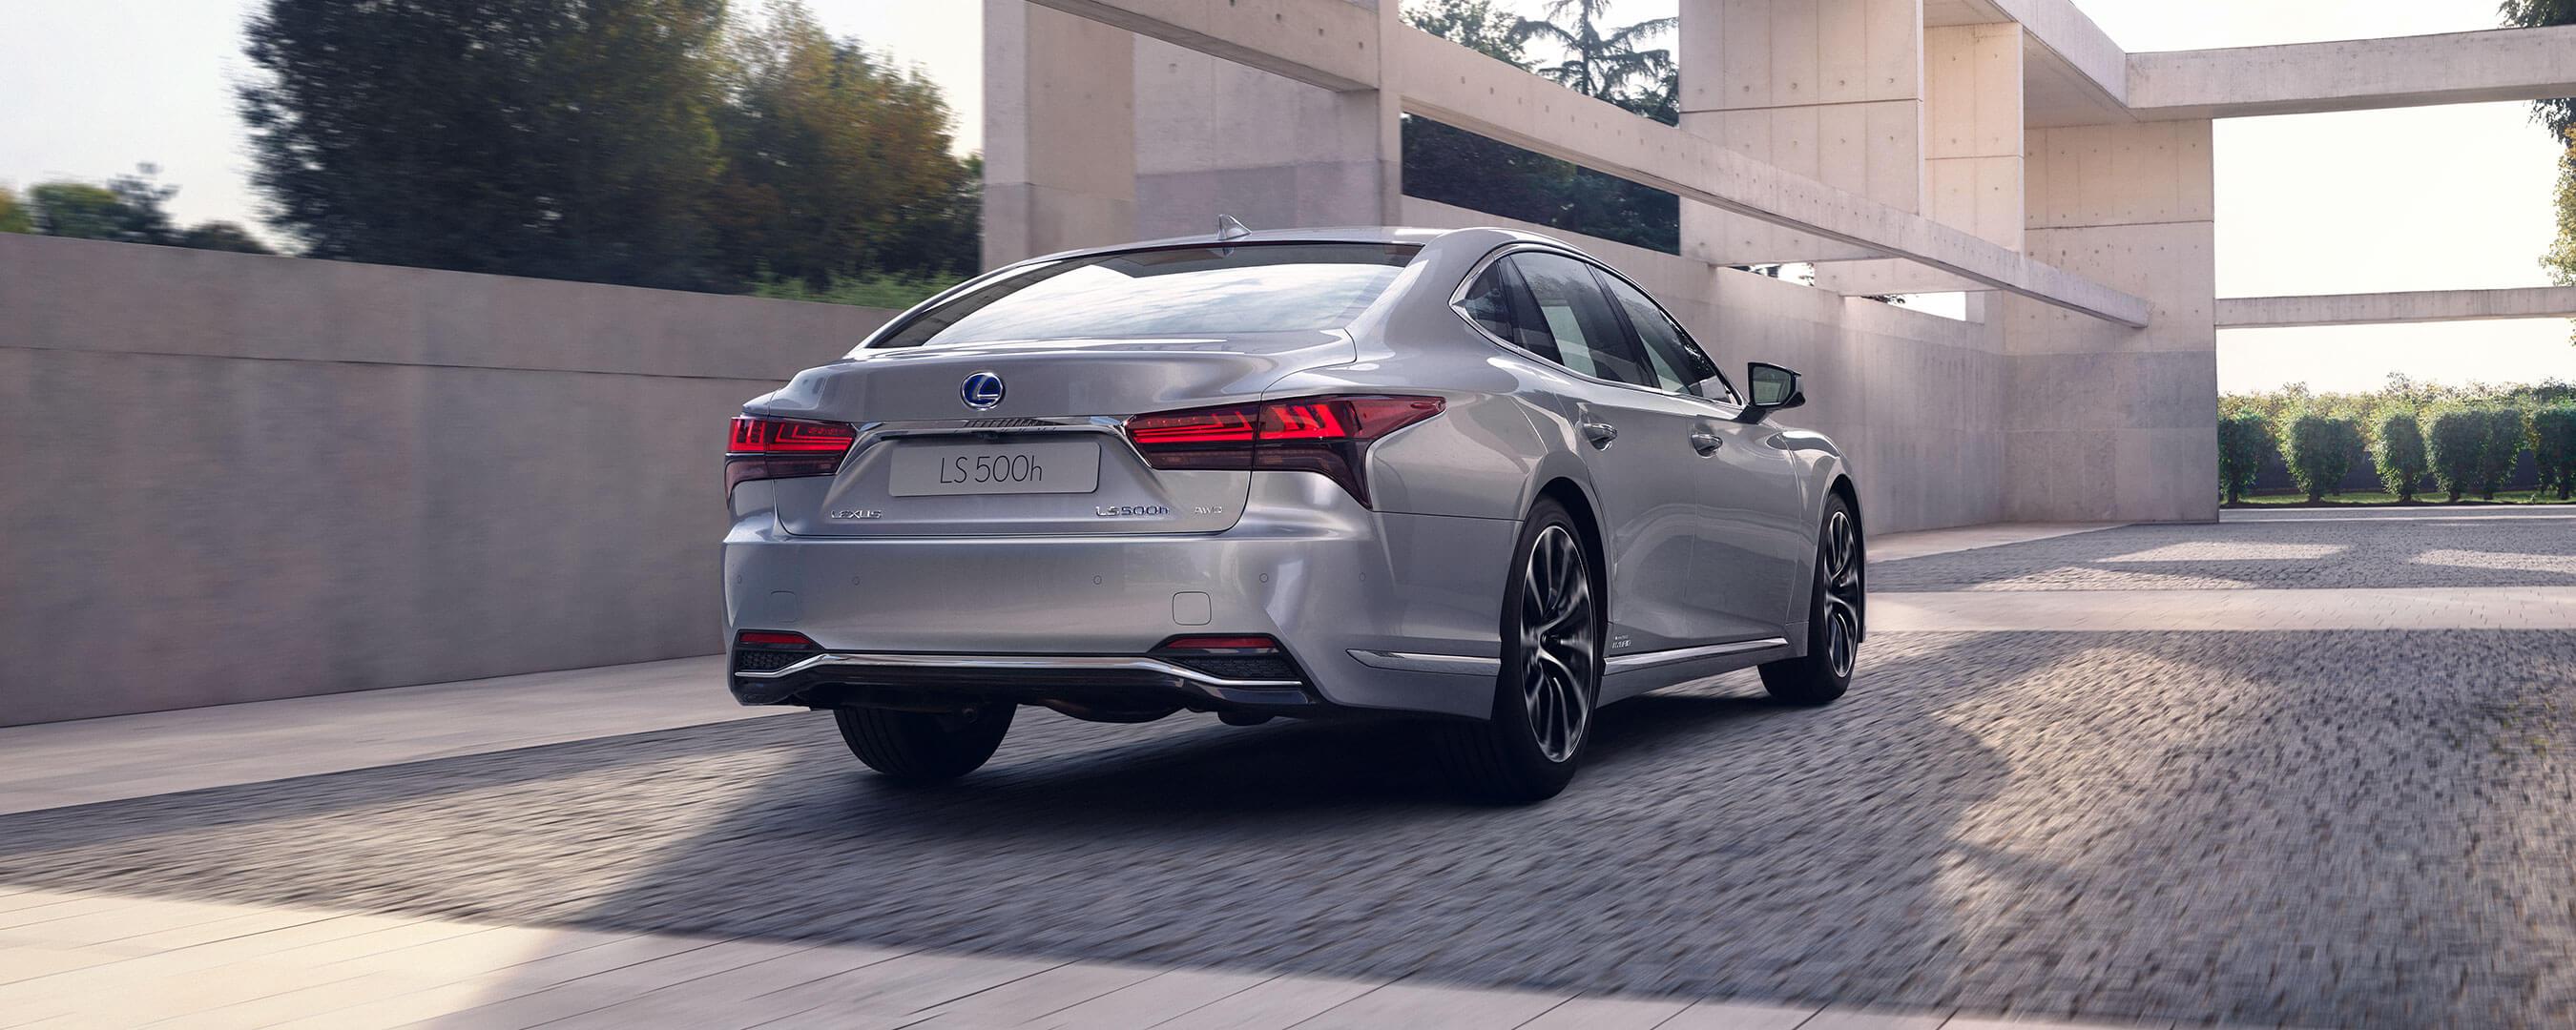 2021 lexus ls experience exterior rear